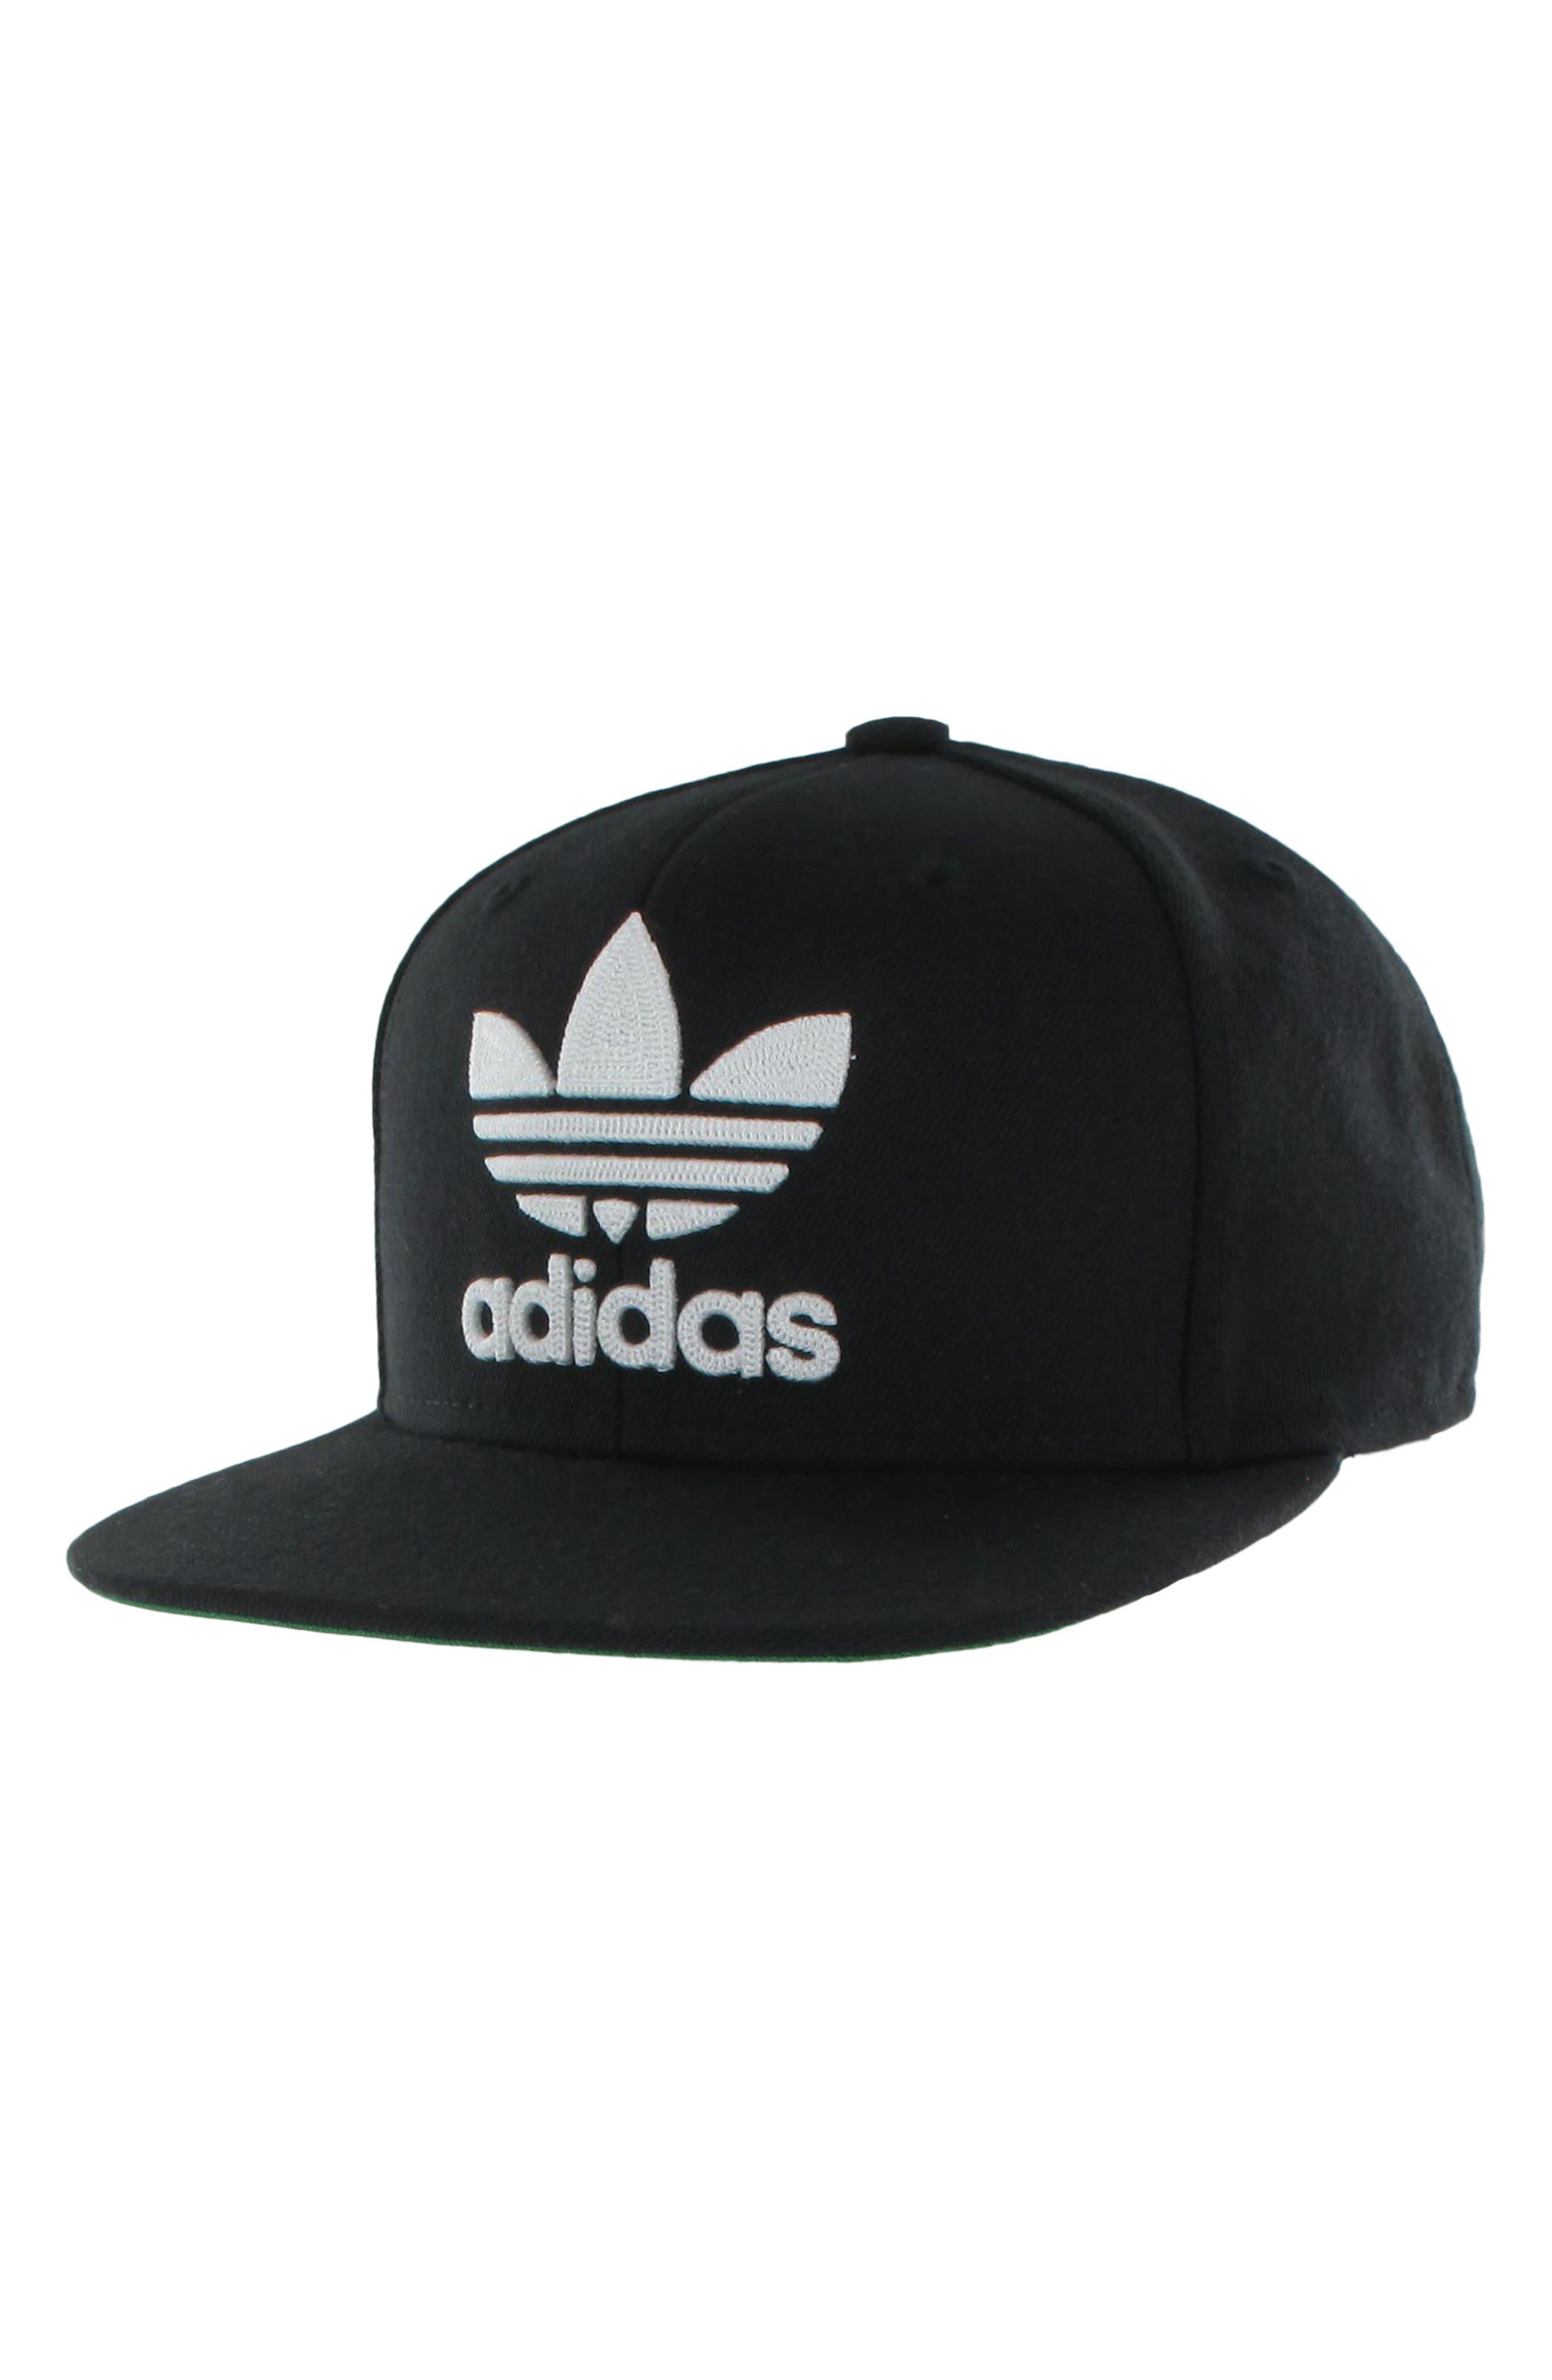 Originals Snapback Hat,                         Main,                         color, BLACK/ WHITE